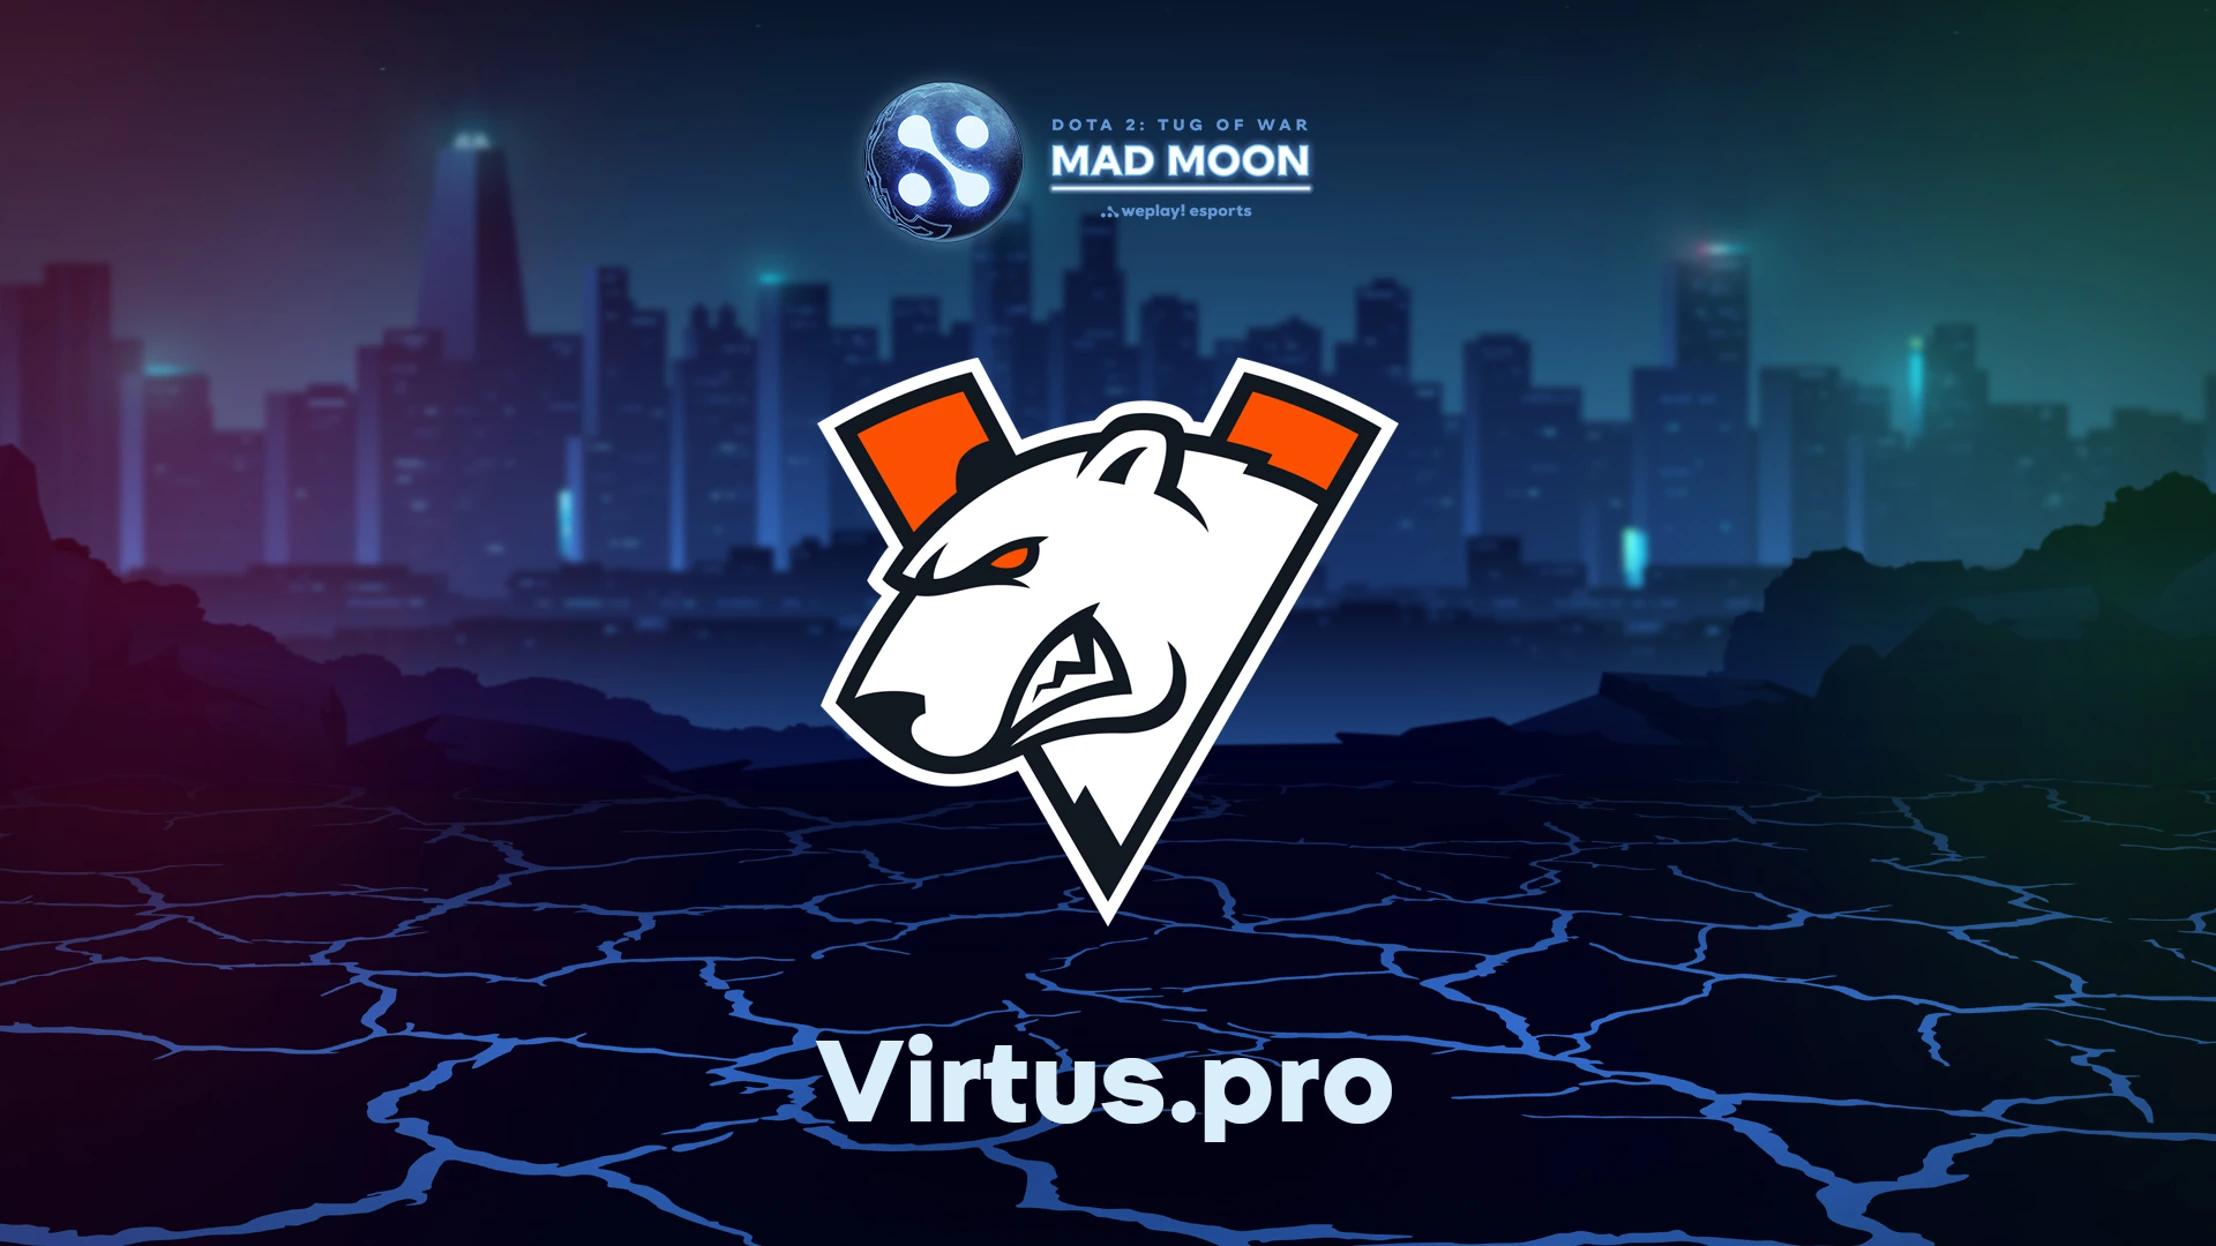 Virtus.pro will play at WePlay! Mad Moon